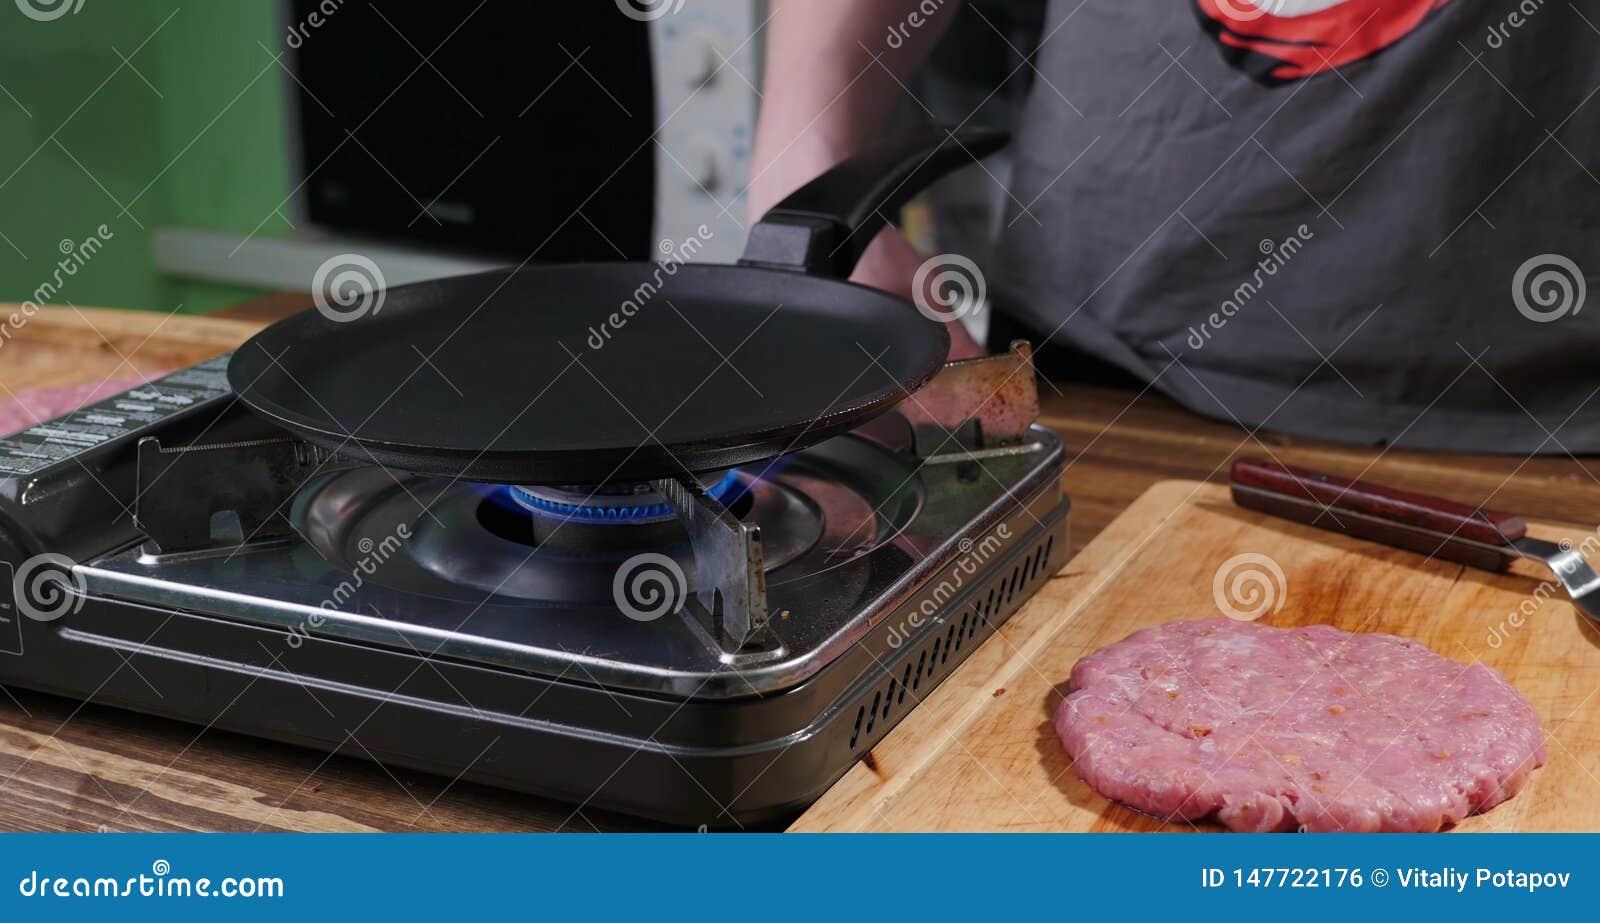 Big pork burger before cooking